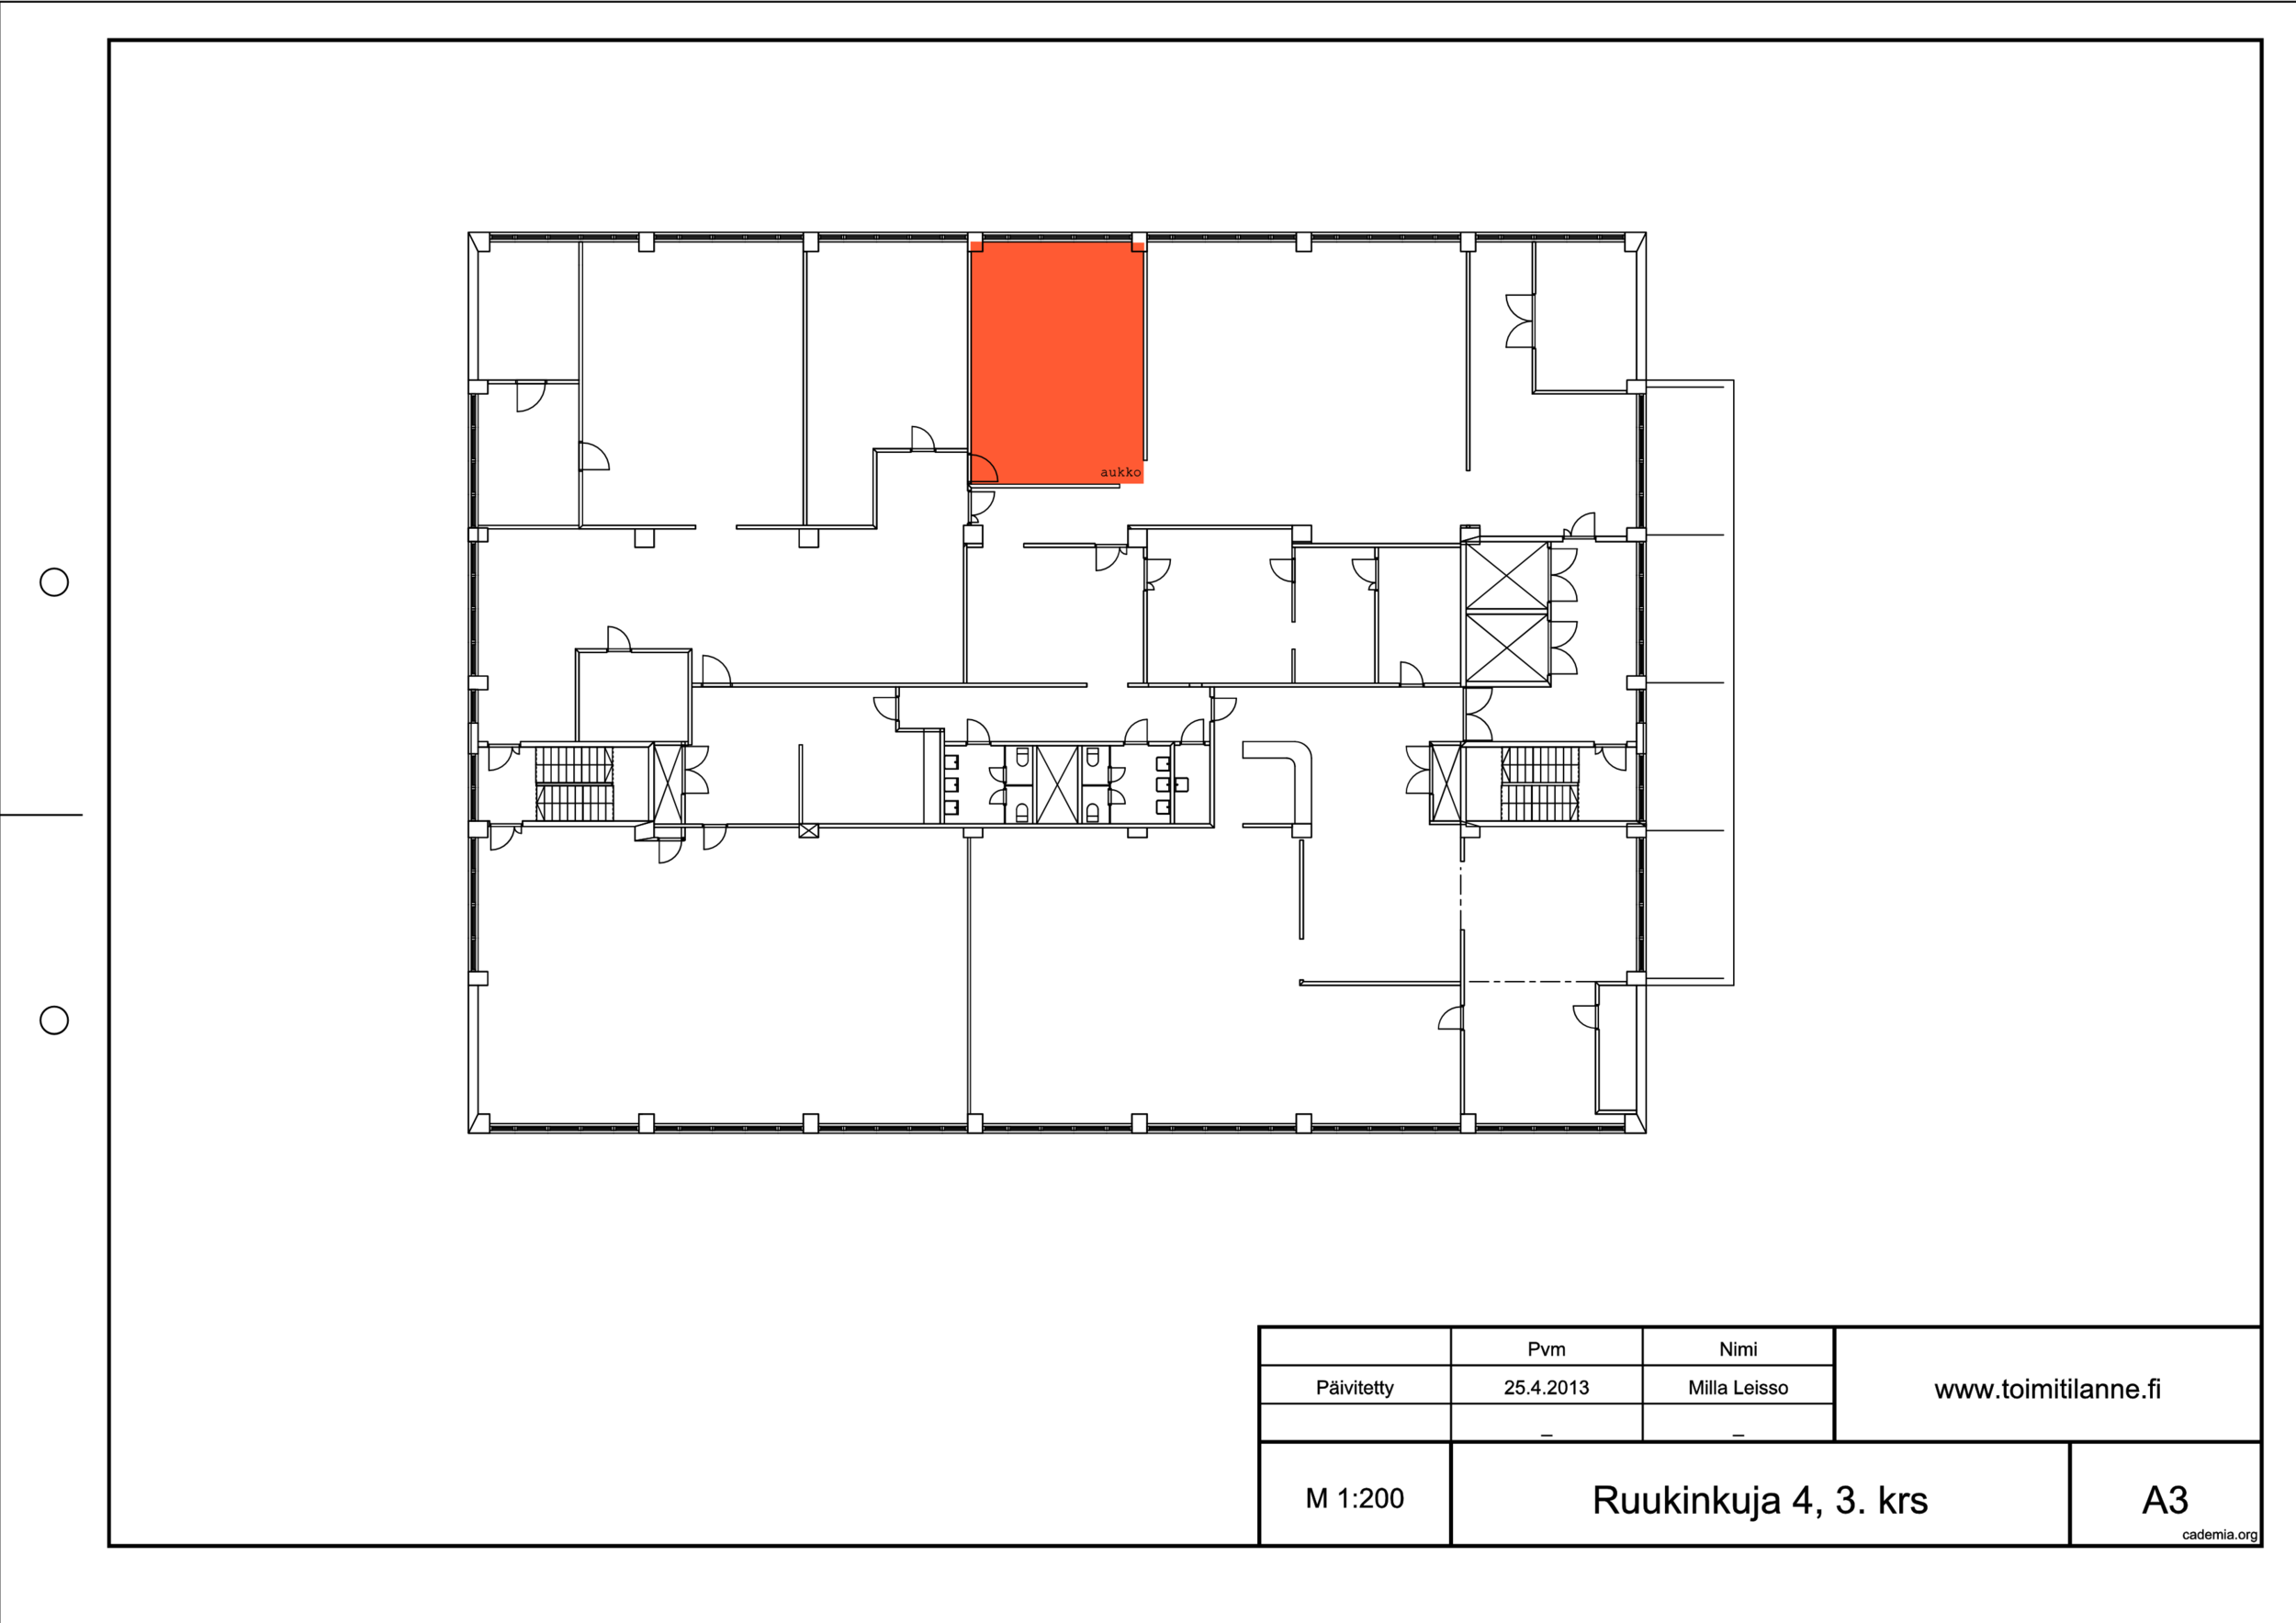 Toimitilanne Suomi, Espoo - Kiviruukki, Ruukinkuja 4, Varastotila 56 m²